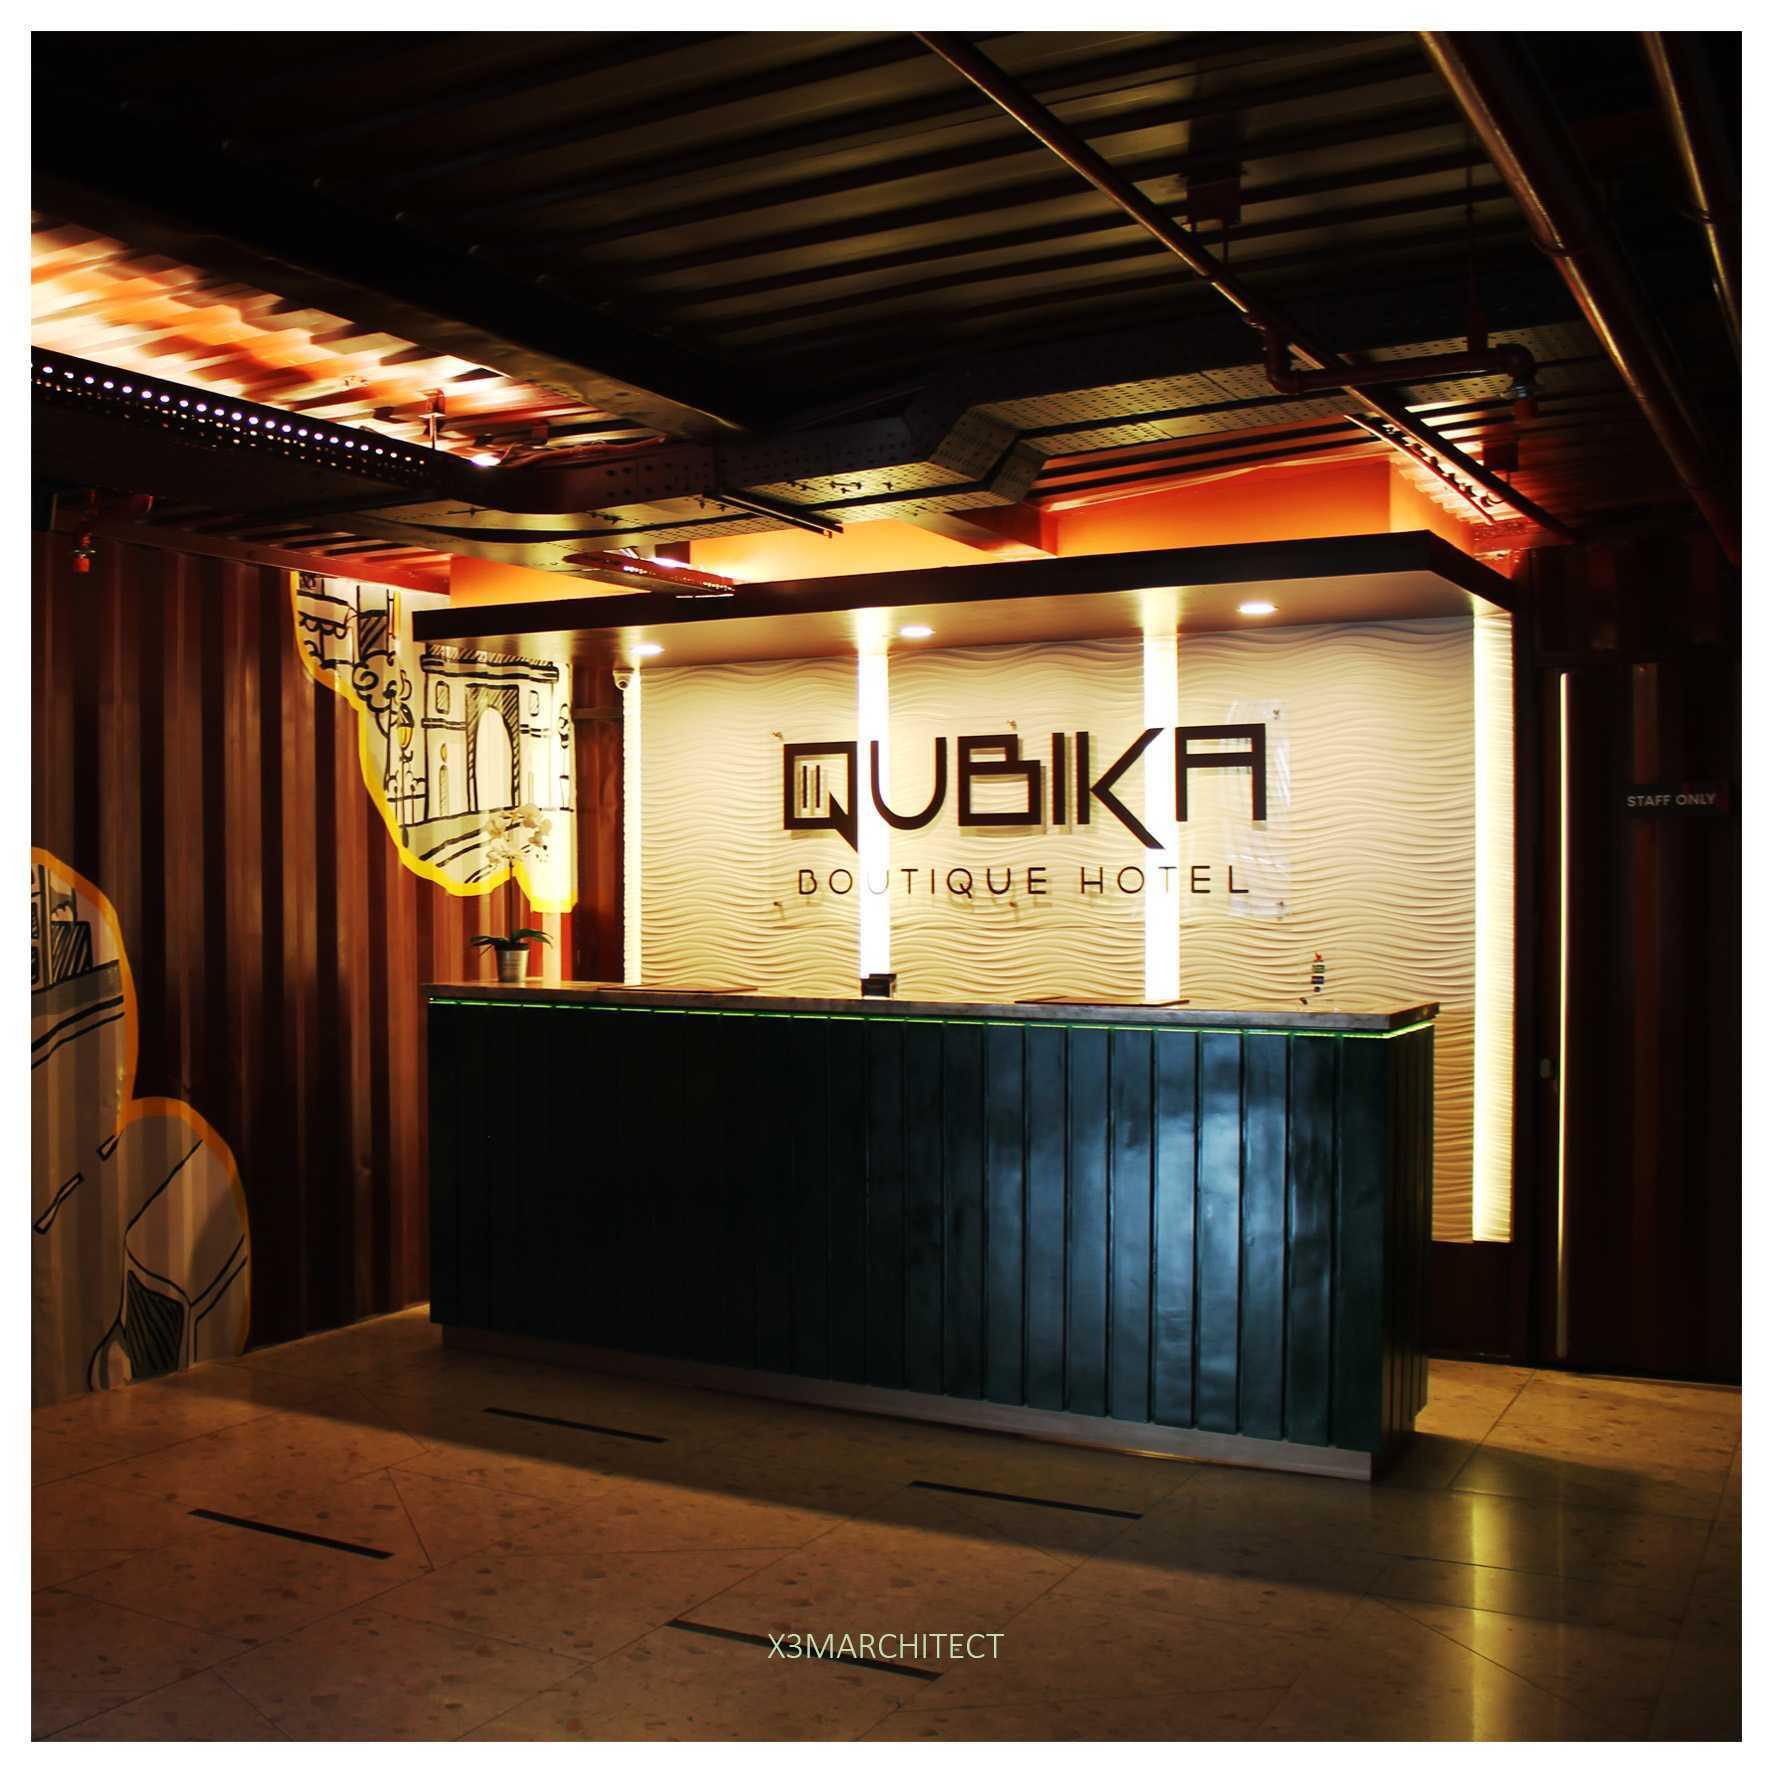 Foto inspirasi ide desain lobby industrial X3m-architects-qubika-hotel oleh X3M ARCHITECTS di Arsitag